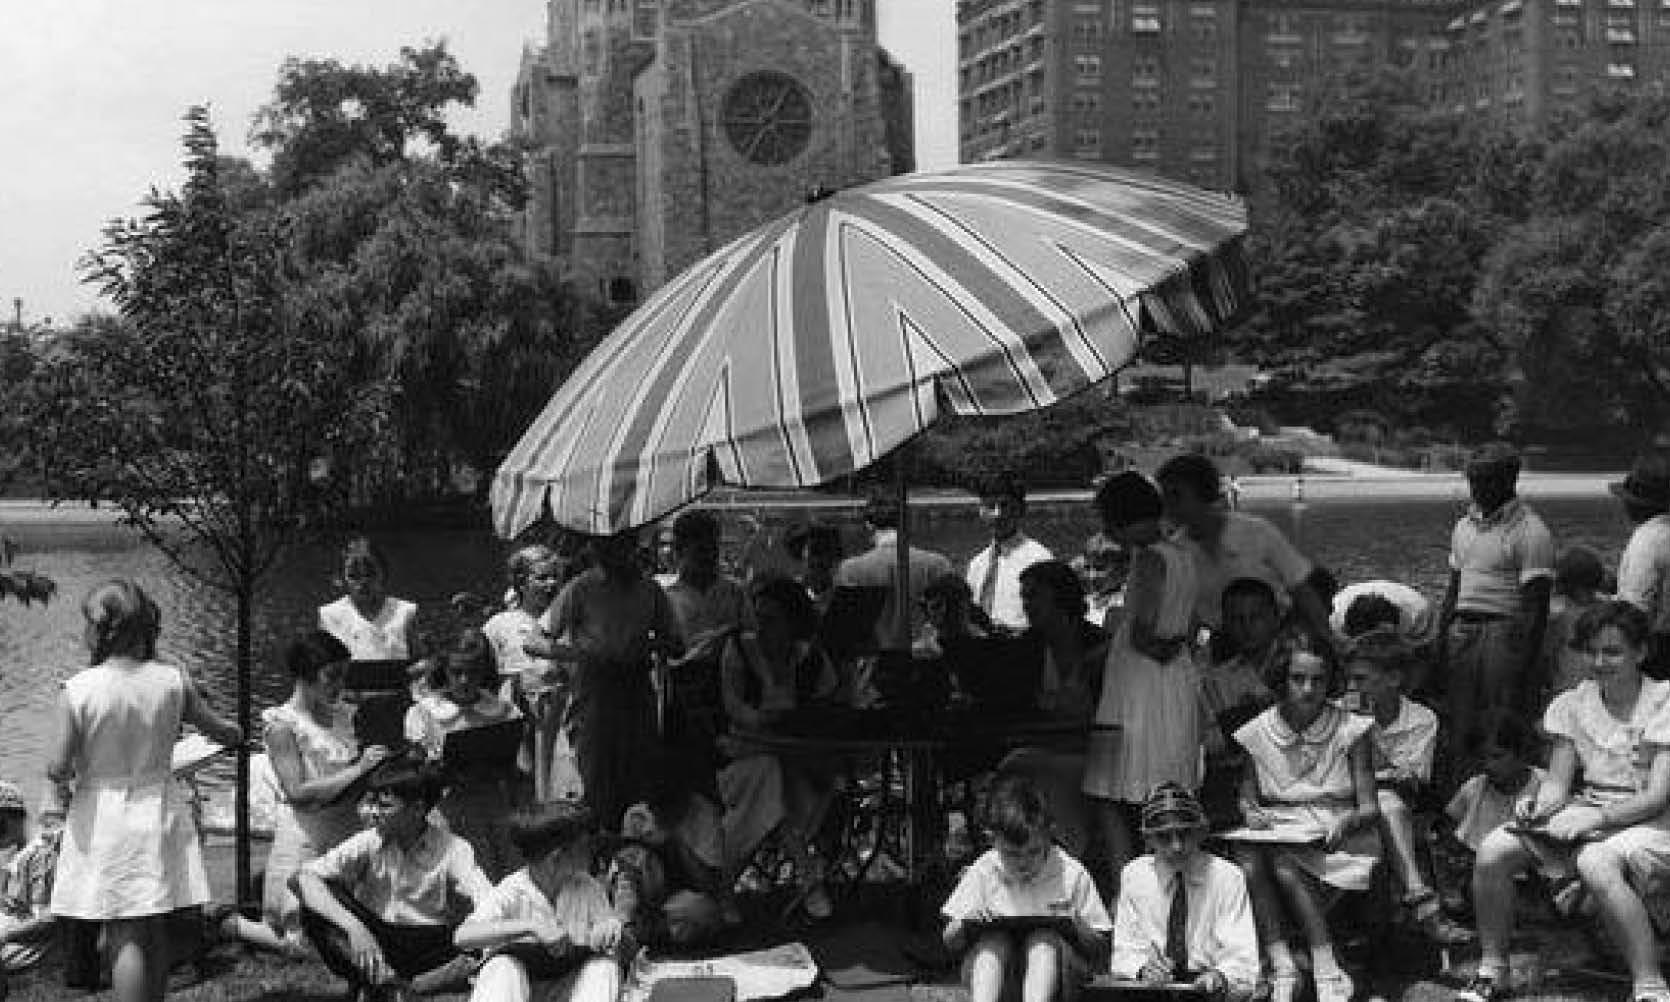 archival photograph